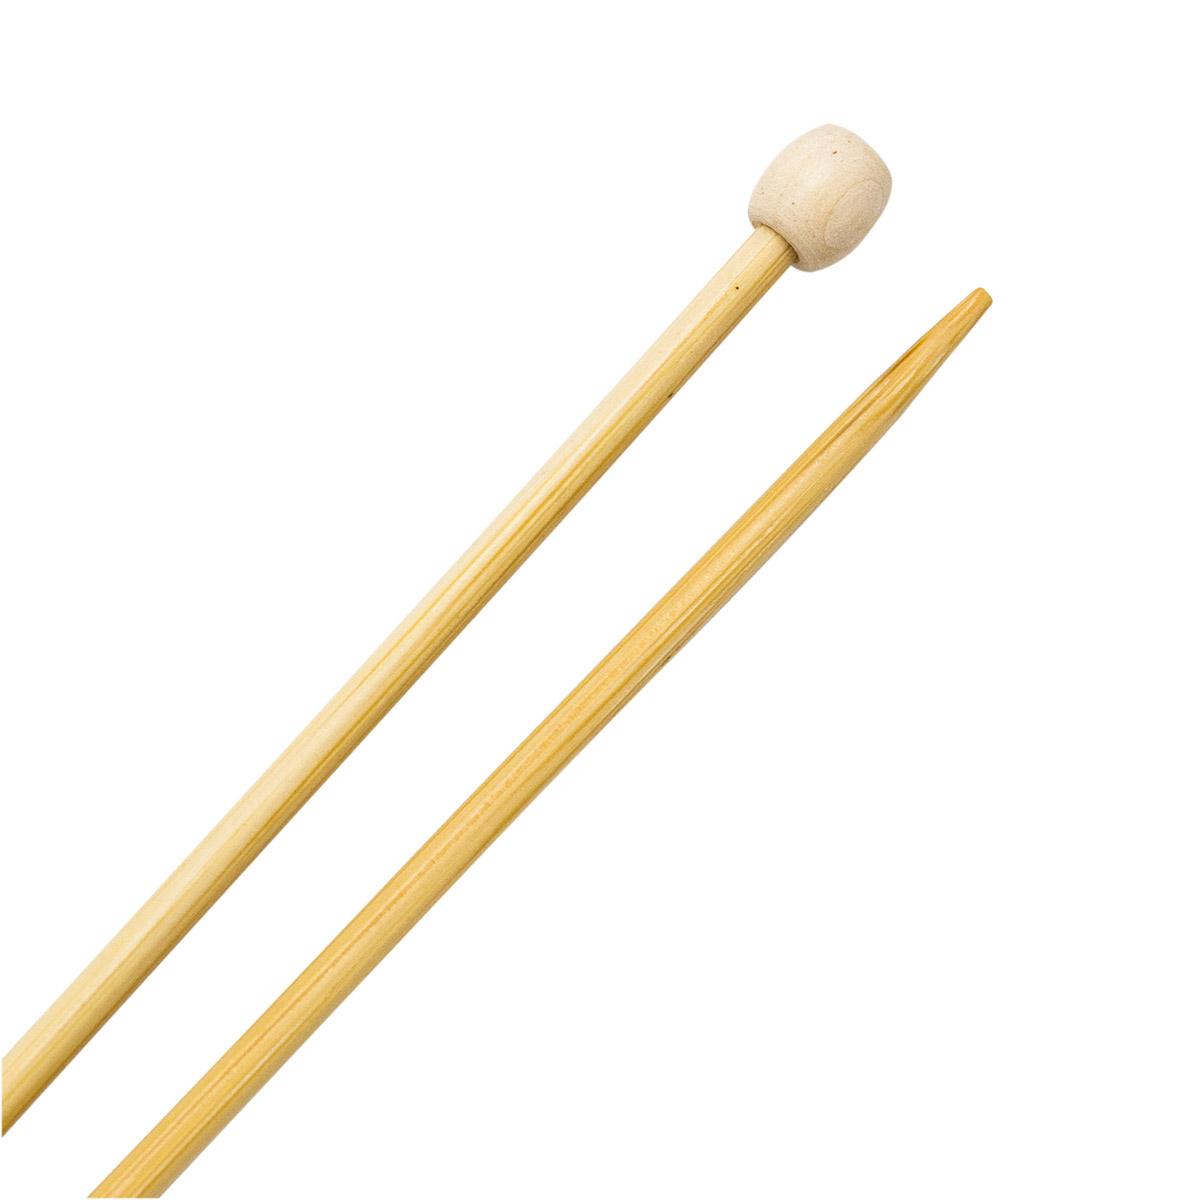 Спицы прямые бамбук 942230, 35 см, 3,0 мм, Hobby&Pro